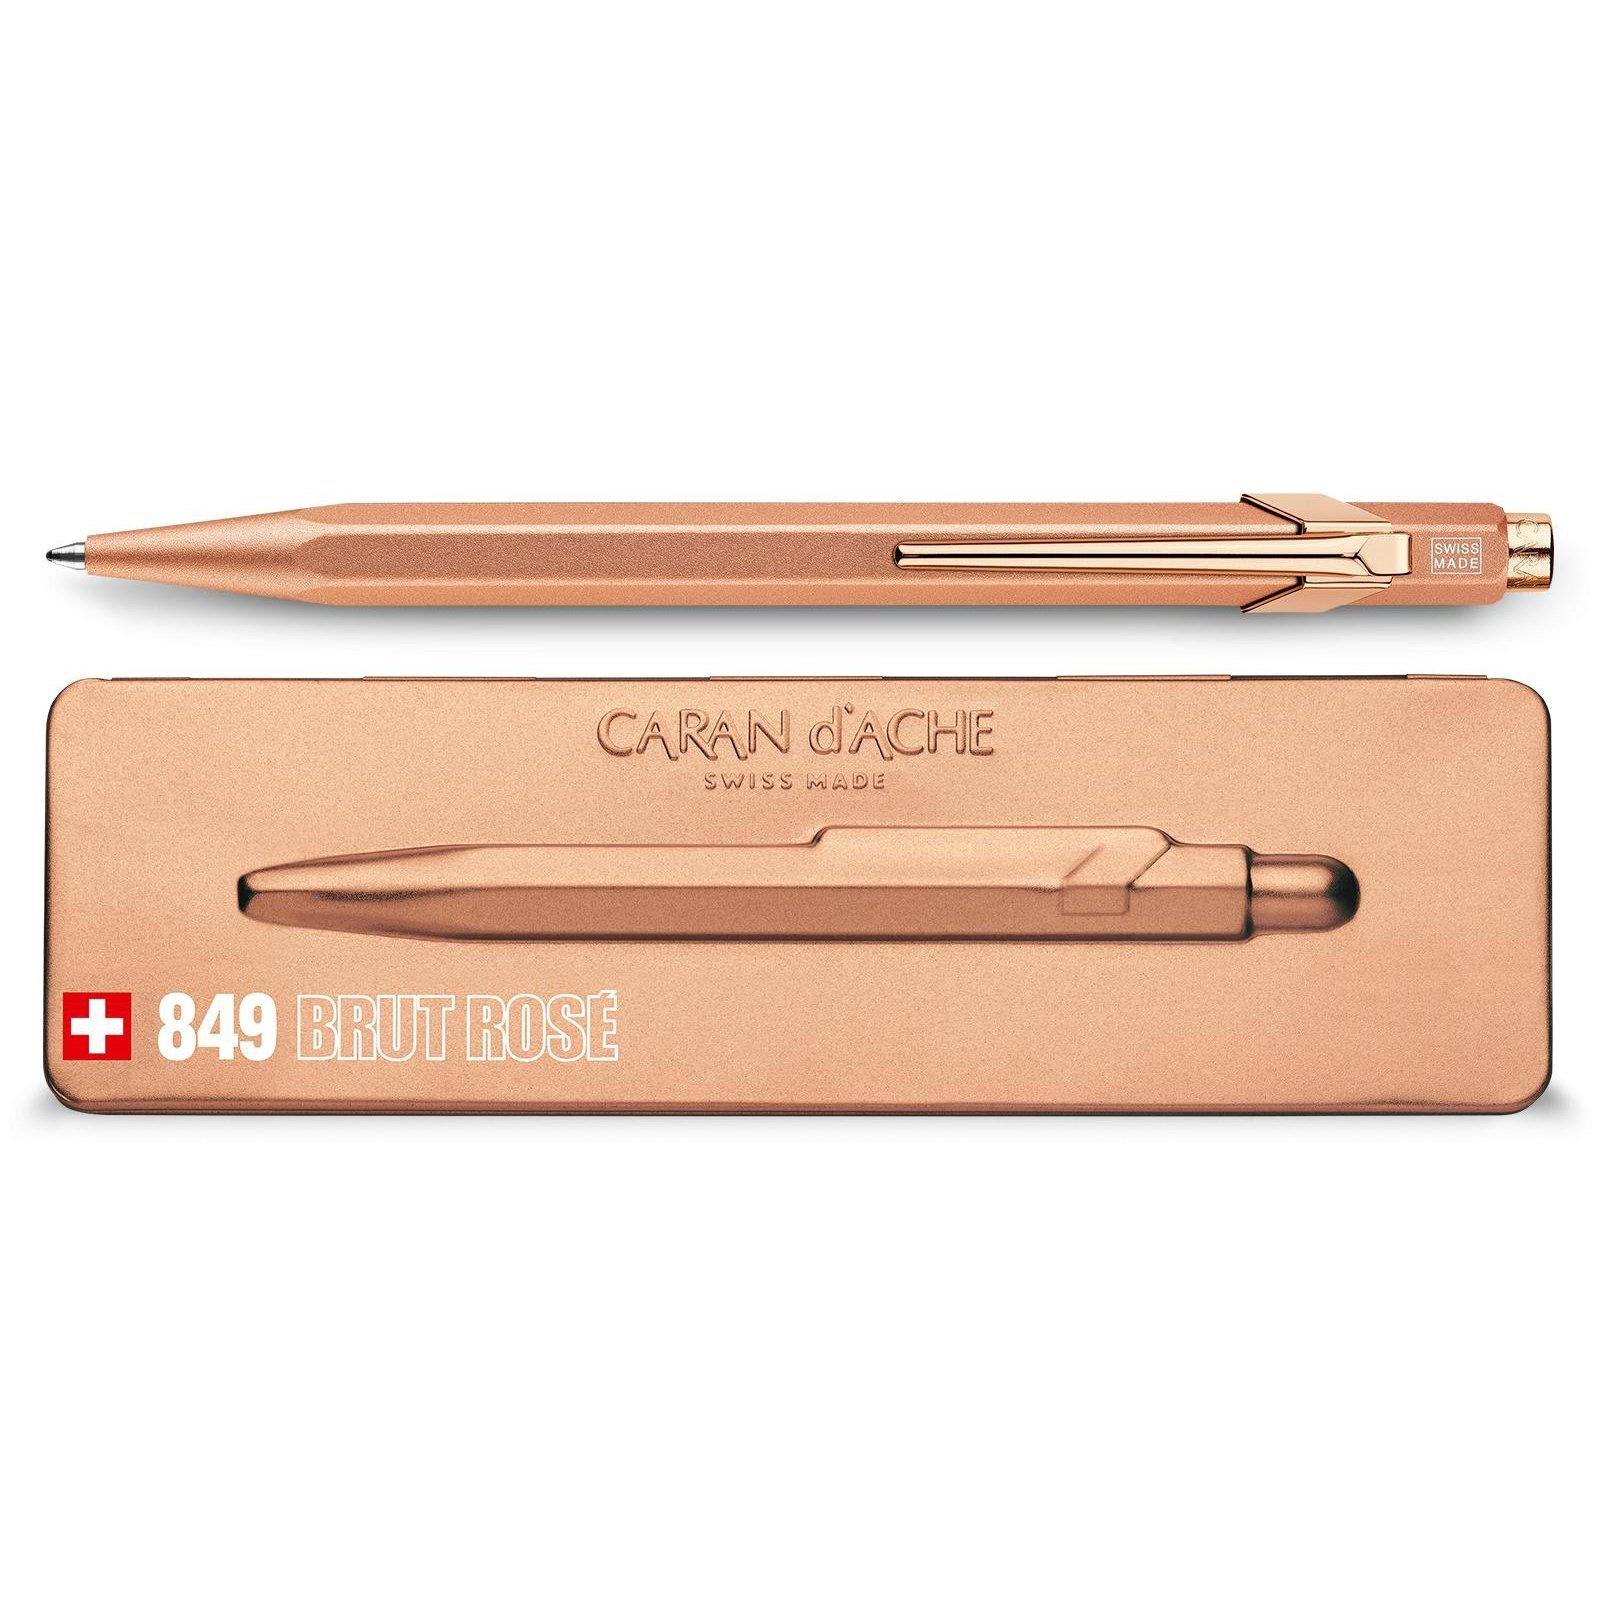 Carandache Office 849 Brut Rose - шариковая ручка, M